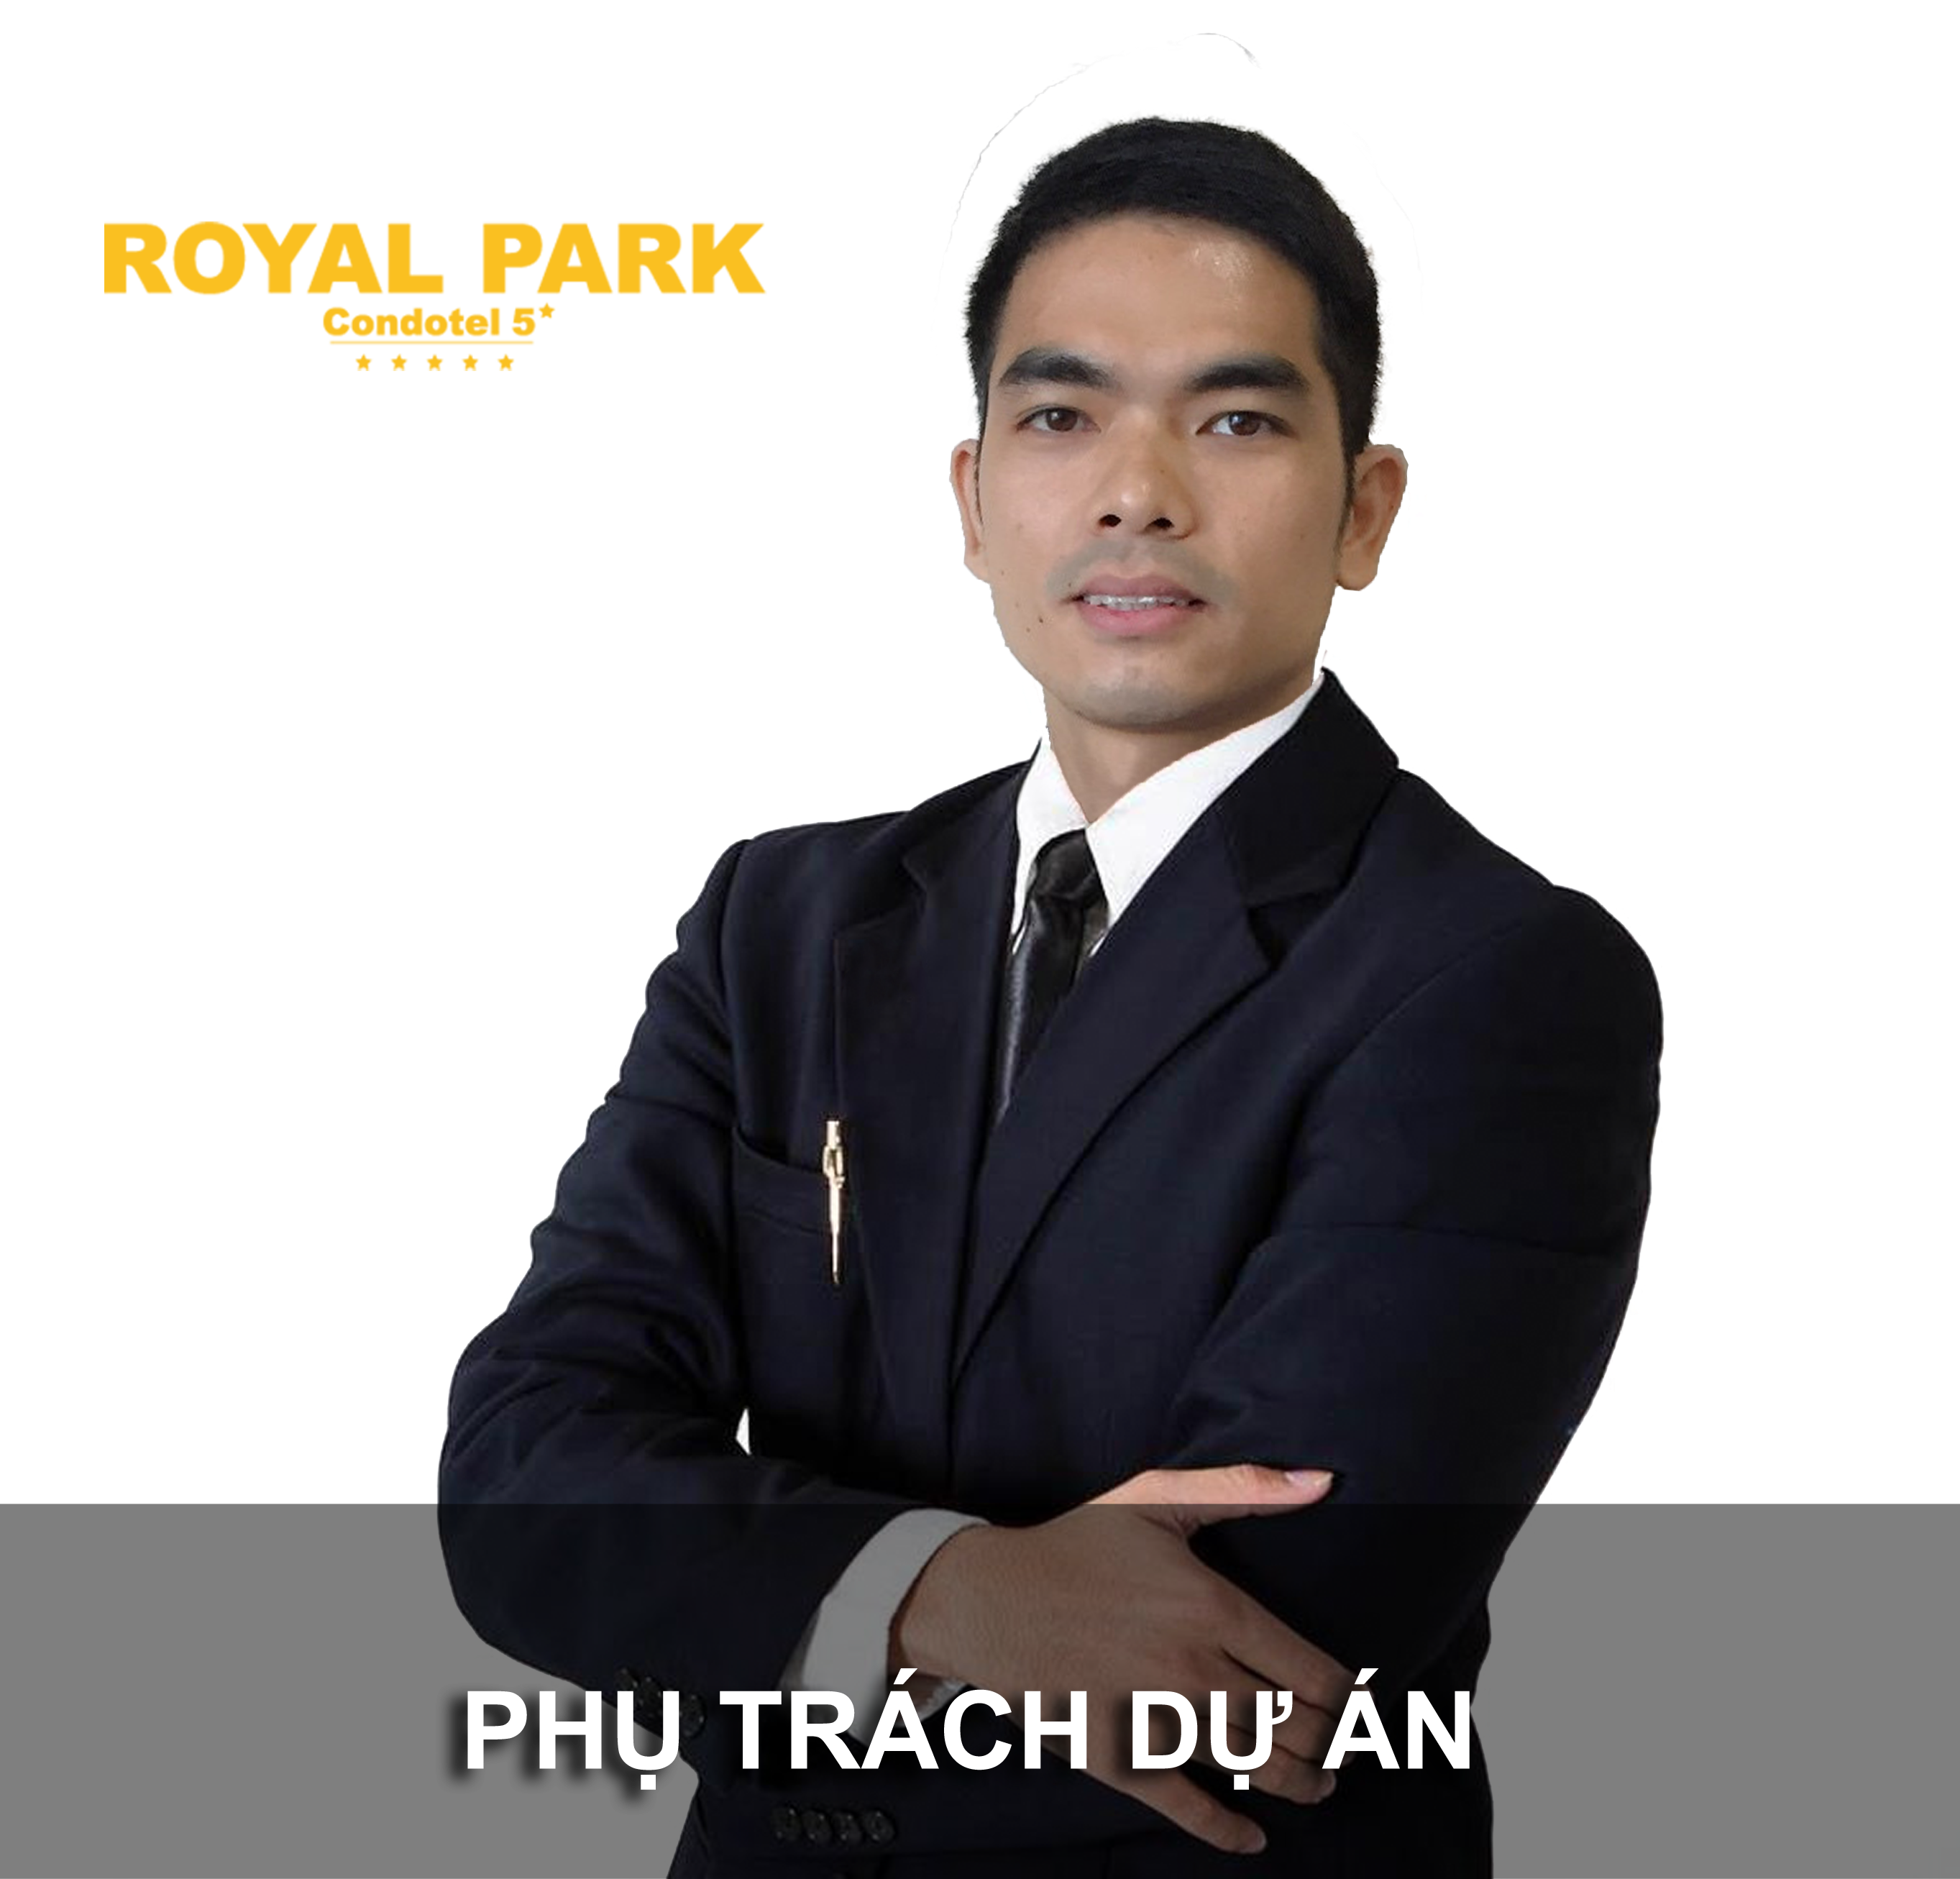 phu-trach-kinh-doanh